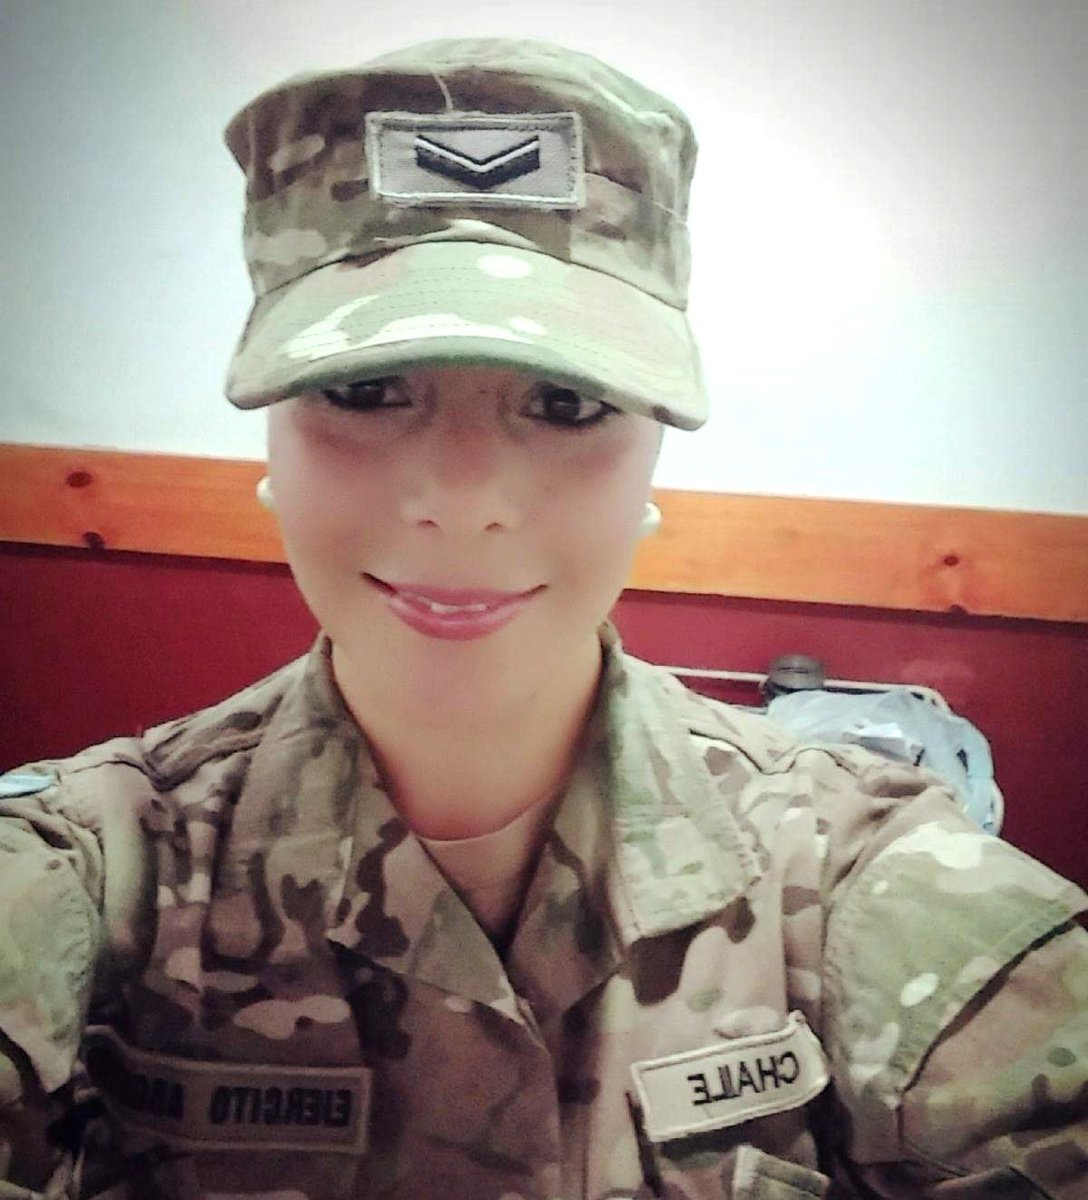 SALTA Es soldado del Ejército, modelo y tiene grandes chances de ser la próxima Miss Belleza Mundial https://bit.ly/2XMapmZpic.twitter.com/3QGjzDb8G8